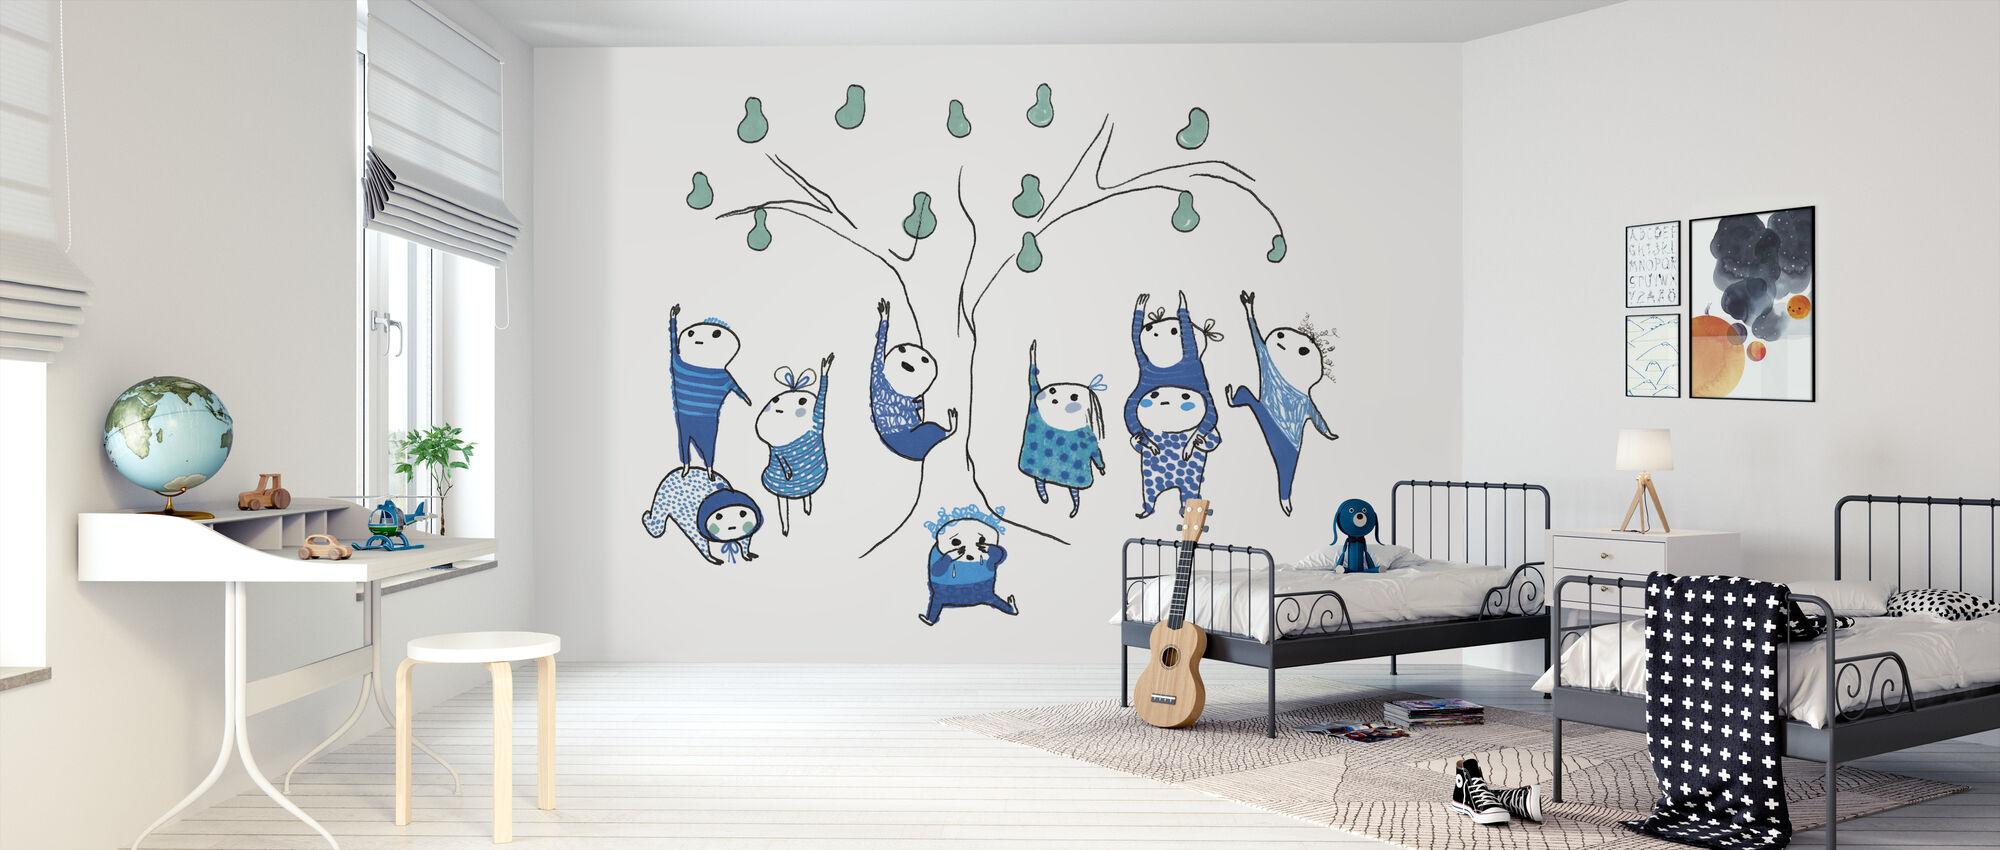 Nine Small Blue Can Not Reach - Wallpaper - Kids Room